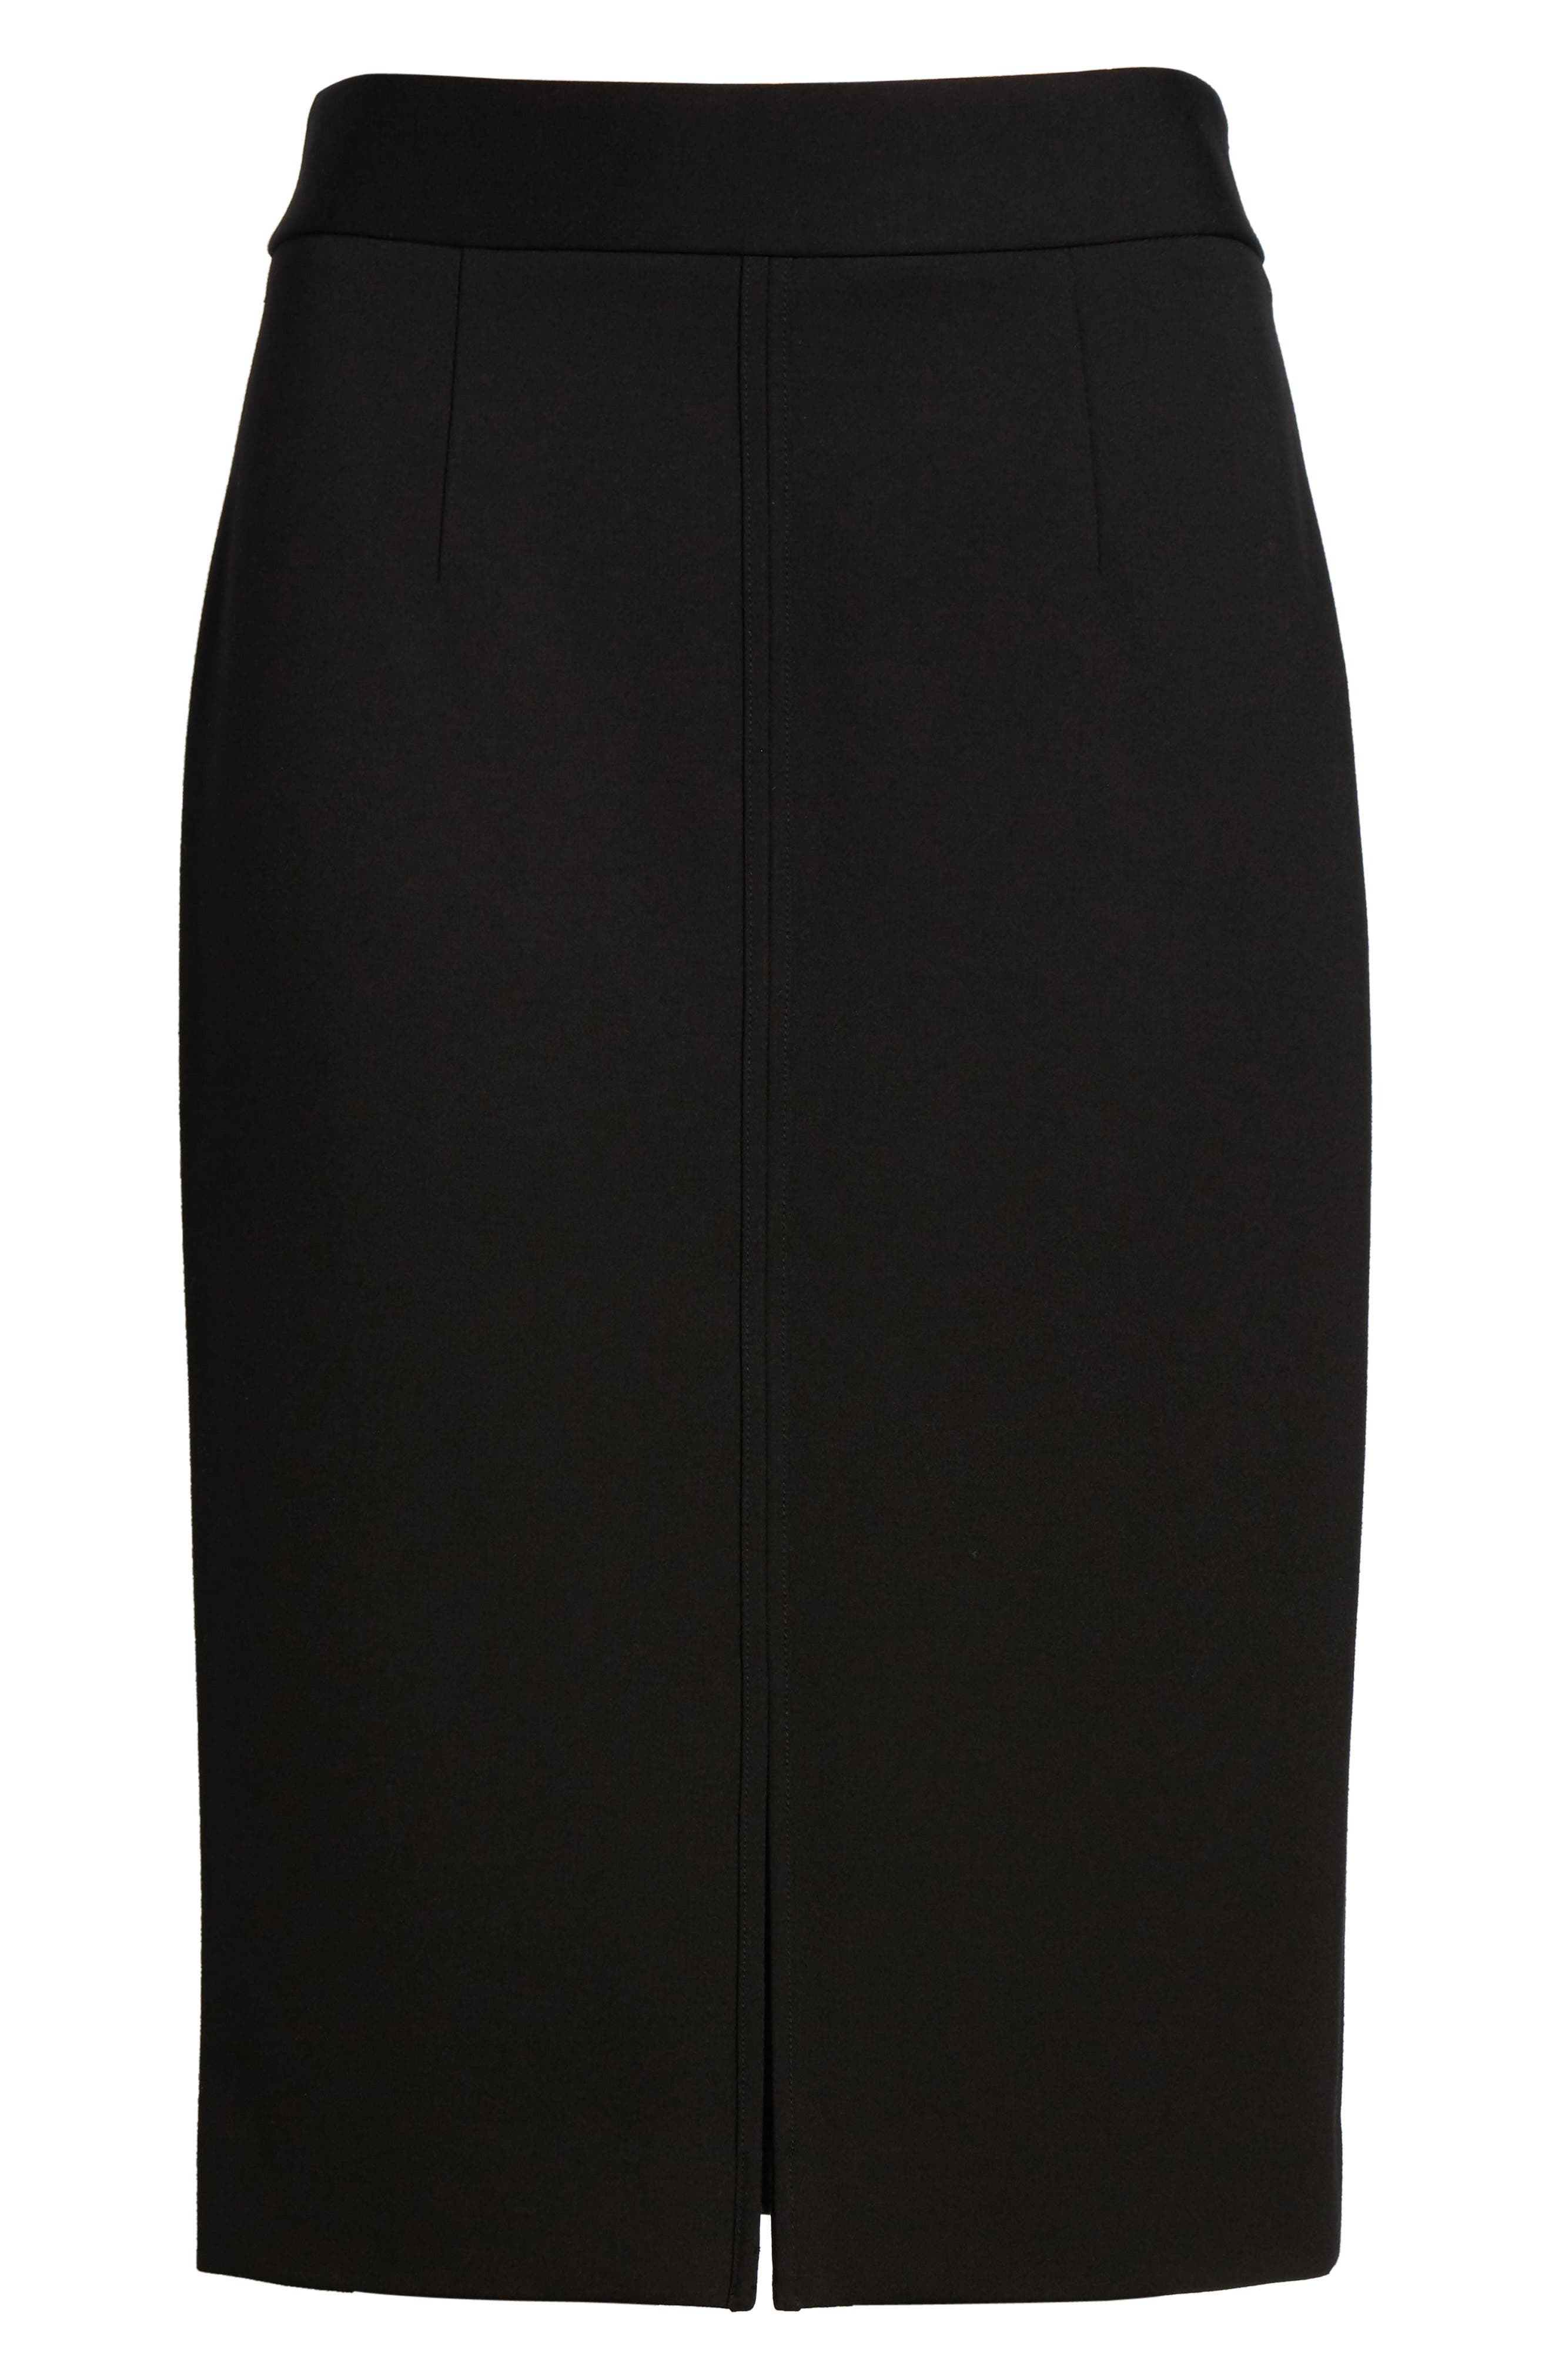 Ponte Knit Pencil Skirt,                             Alternate thumbnail 6, color,                             001